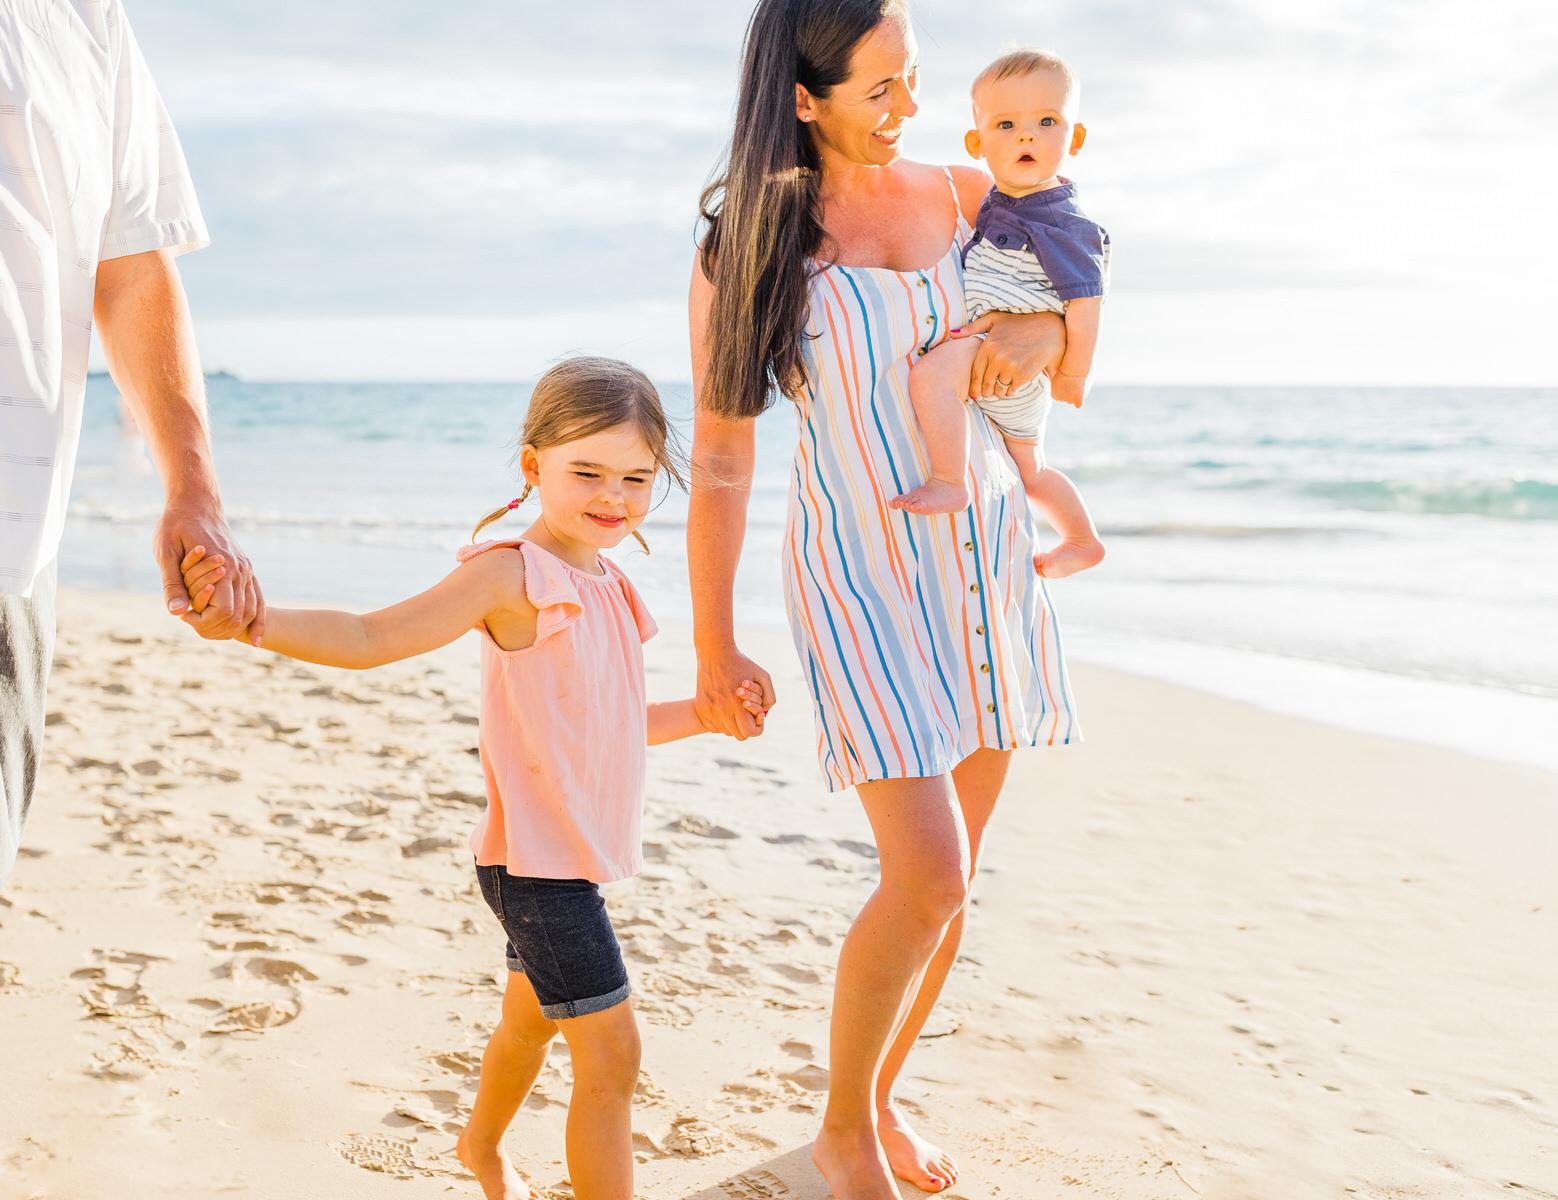 big-island-family-photographer-hapuna-beach-sunset-7234.jpg